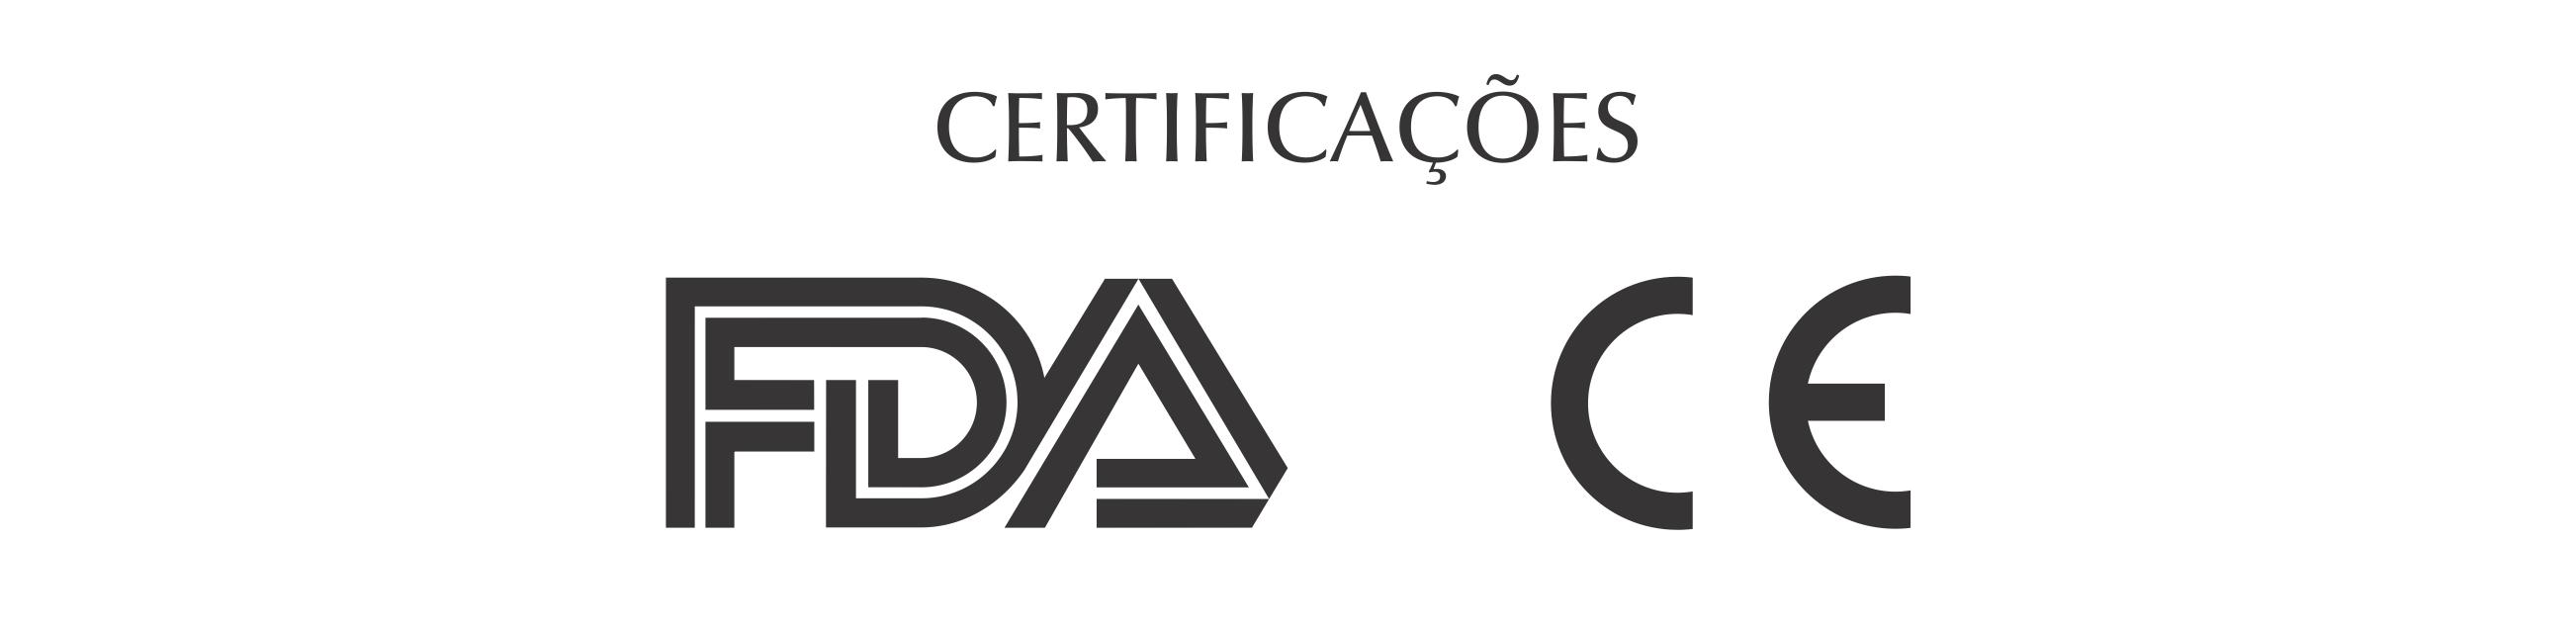 https://microdont.com.br/wp-content/uploads/2021/02/logo_cert_port.png